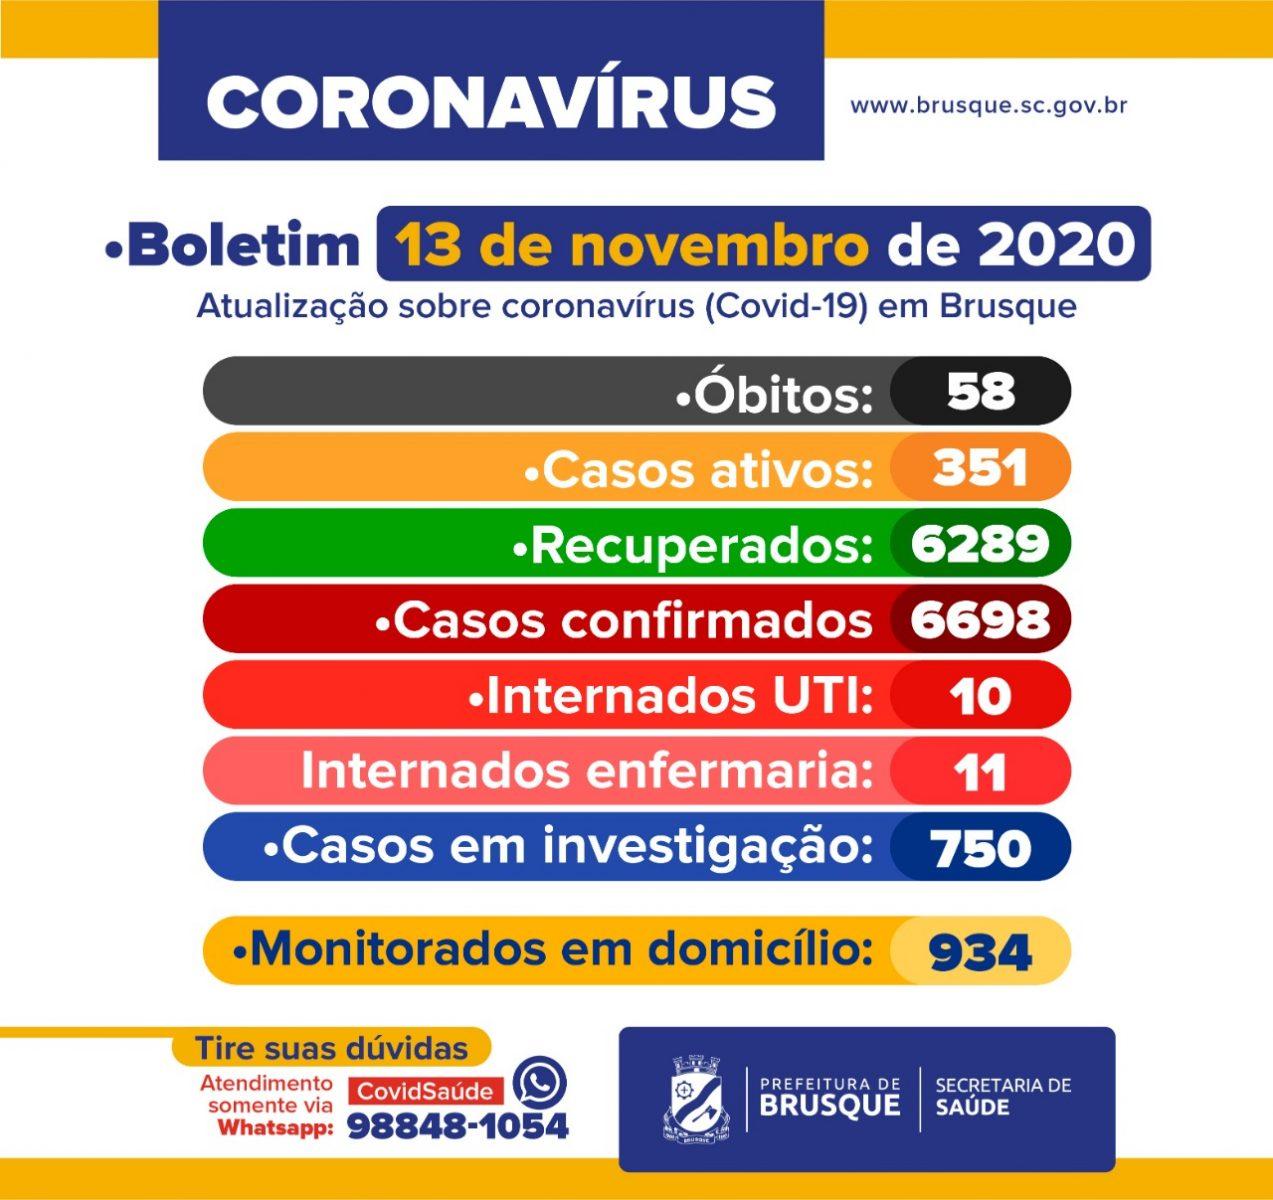 Covid-19: Confira o boletim epidemiológico desta sexta-feira (13)